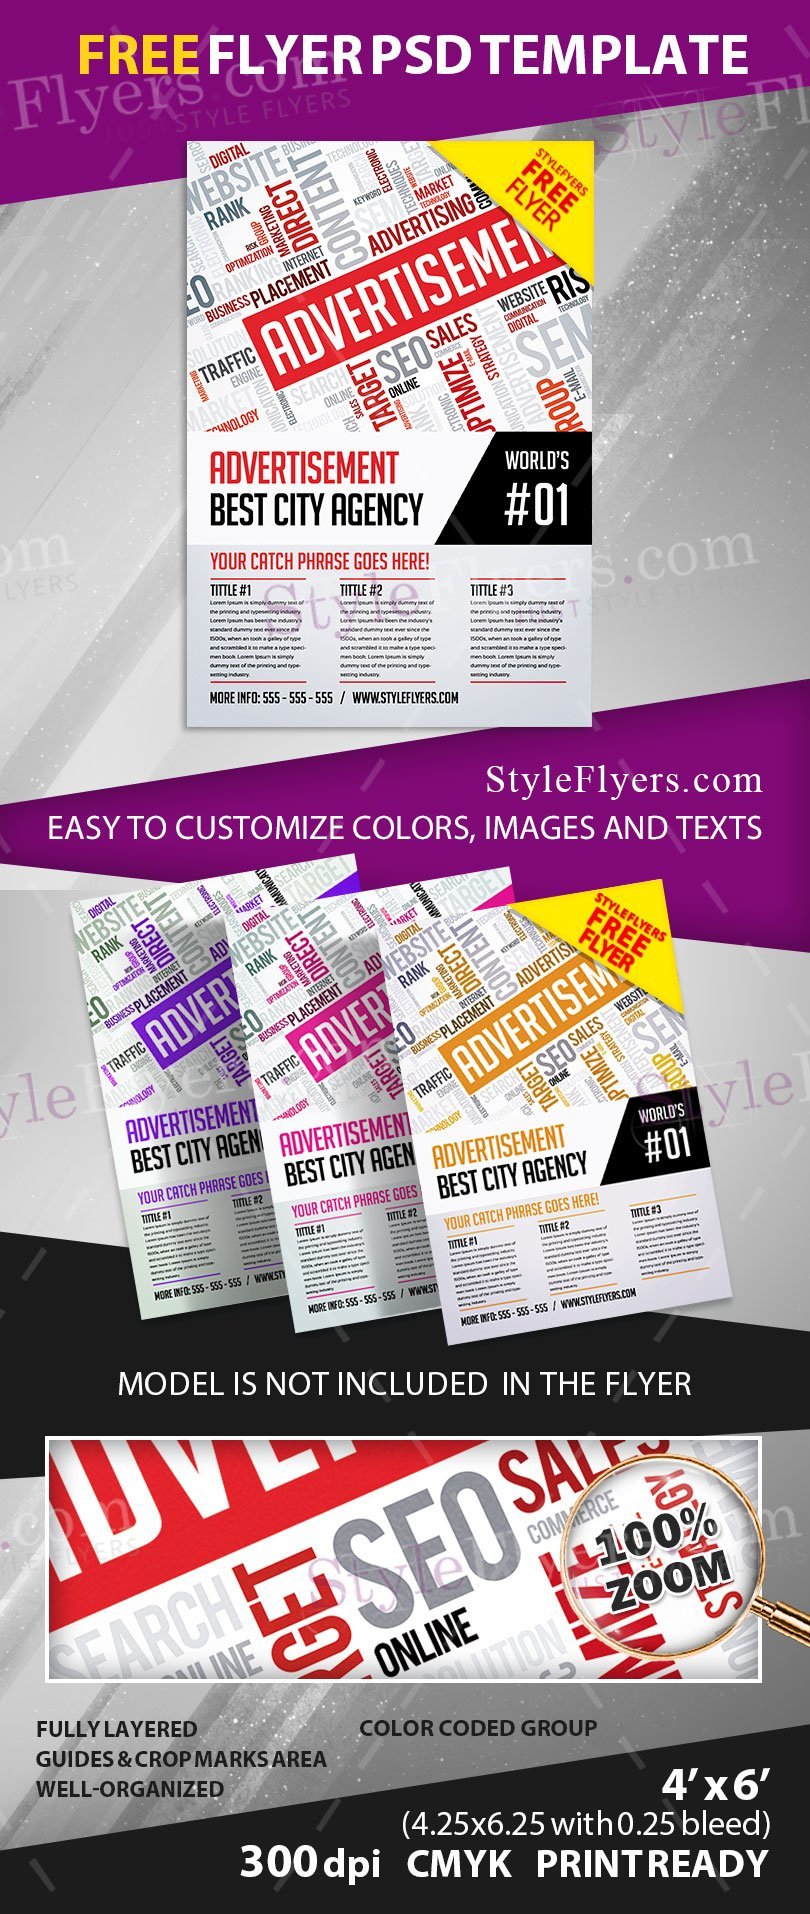 preview_advertisement_psd_flyer_template